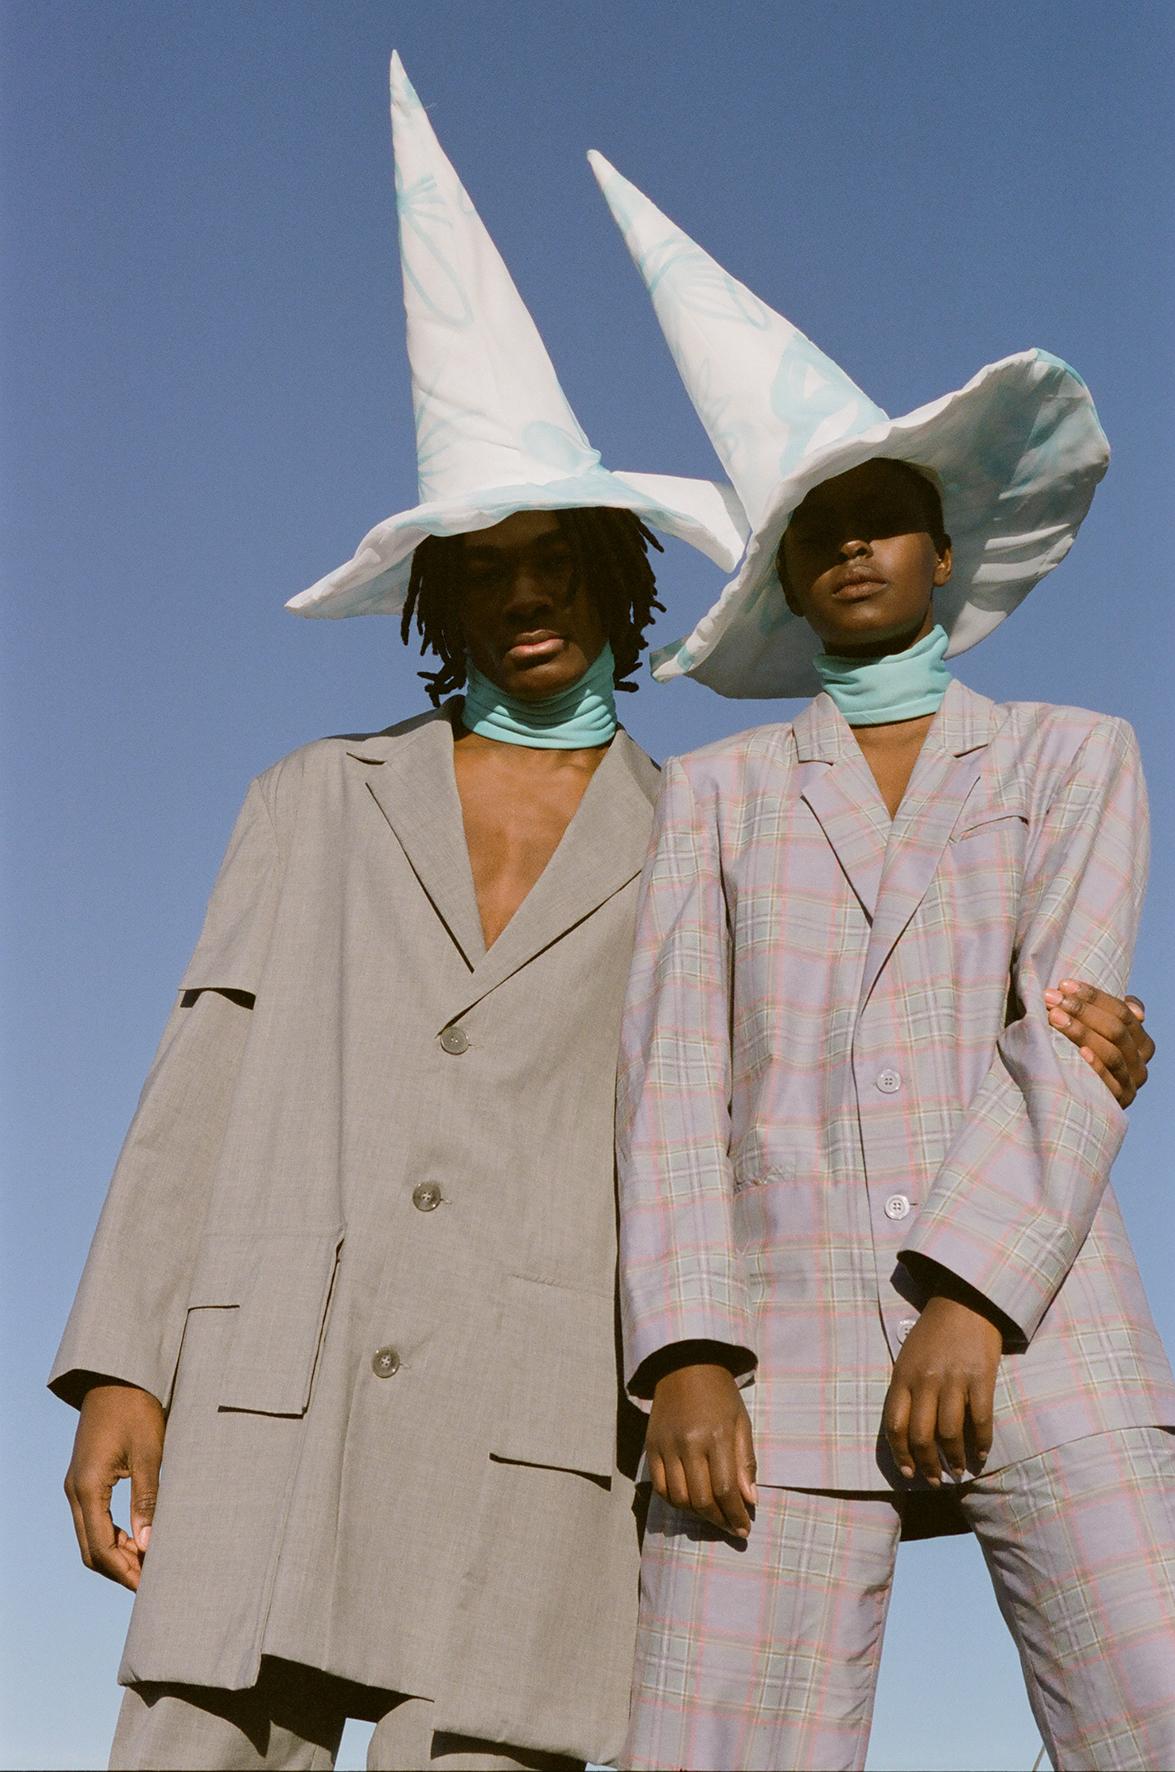 Jacket and trousers  NAND  Hats  AMANDA VARHAUGVIK